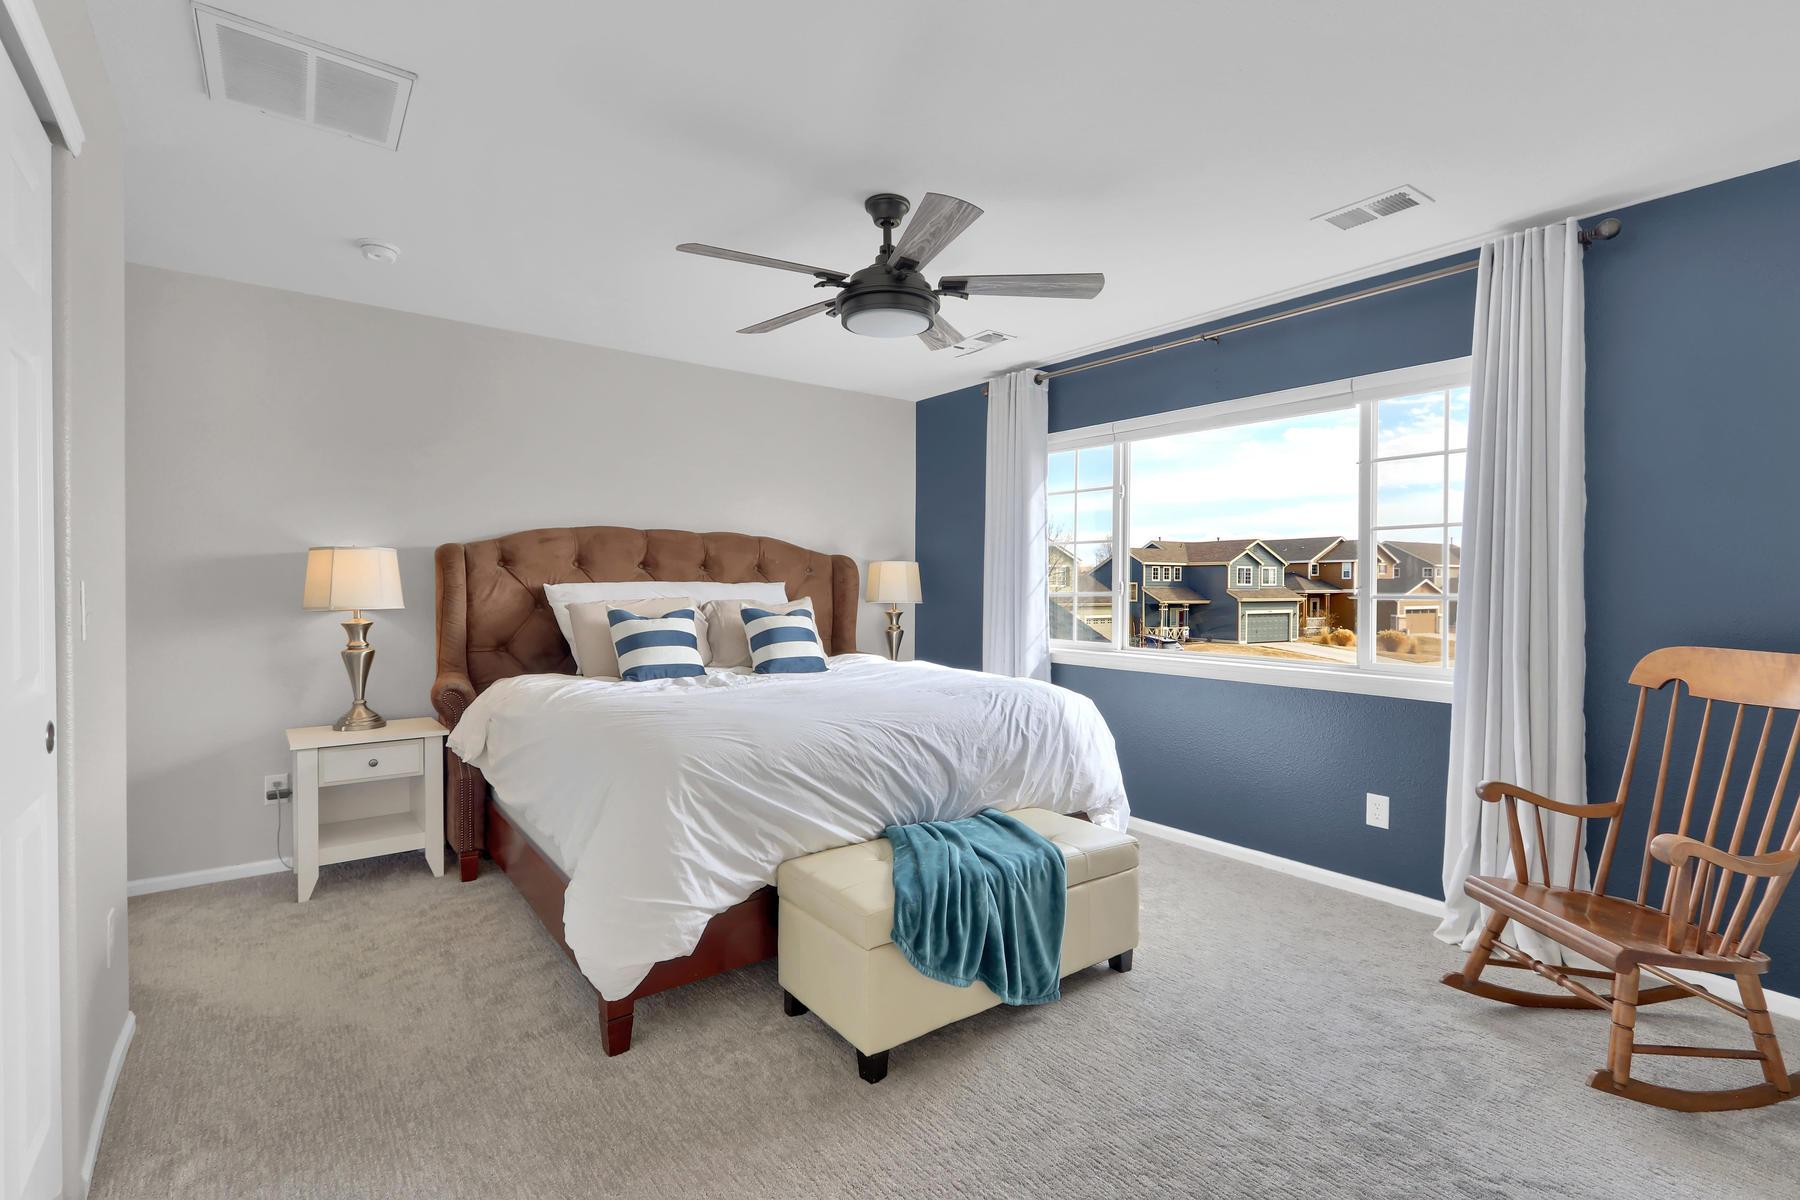 315 Andrew Dr Dacono CO 80514-013-18-Bedroom-MLS_Size.jpg